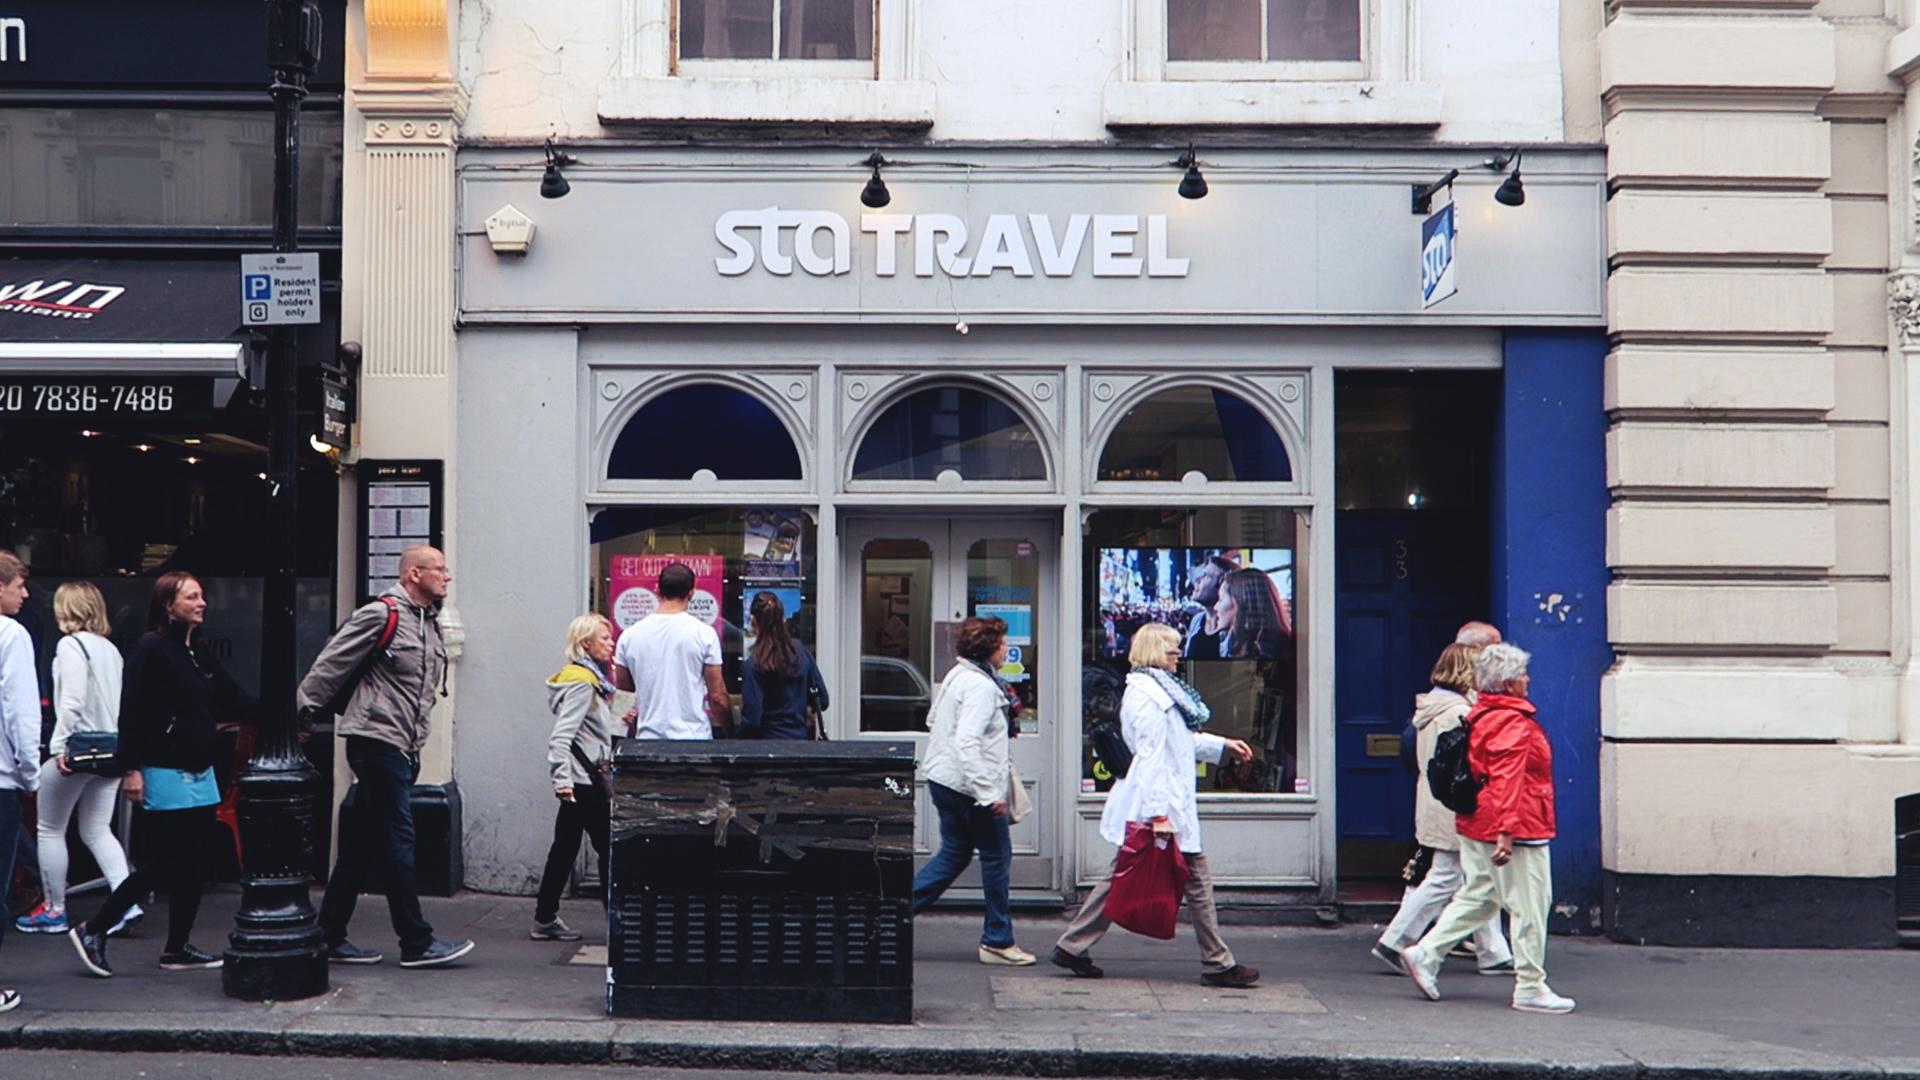 STA Travel Covent Garden